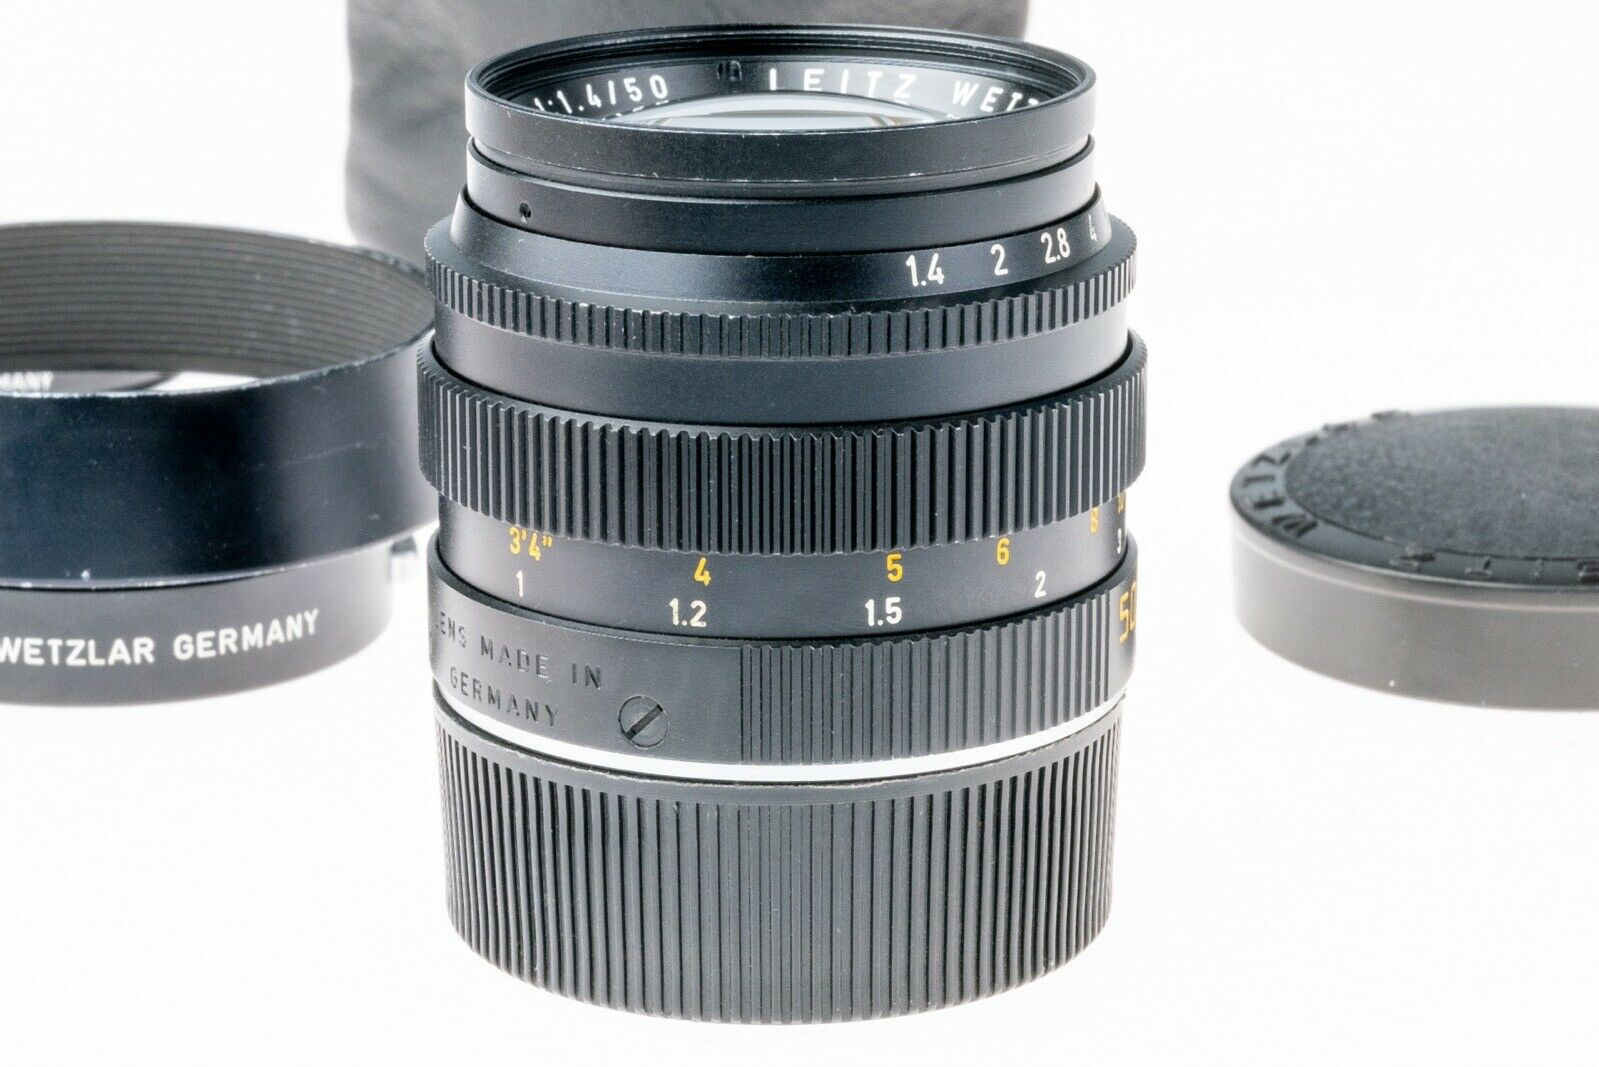 Leica Summilux 50mm 1.4 Wetzlar - 11114